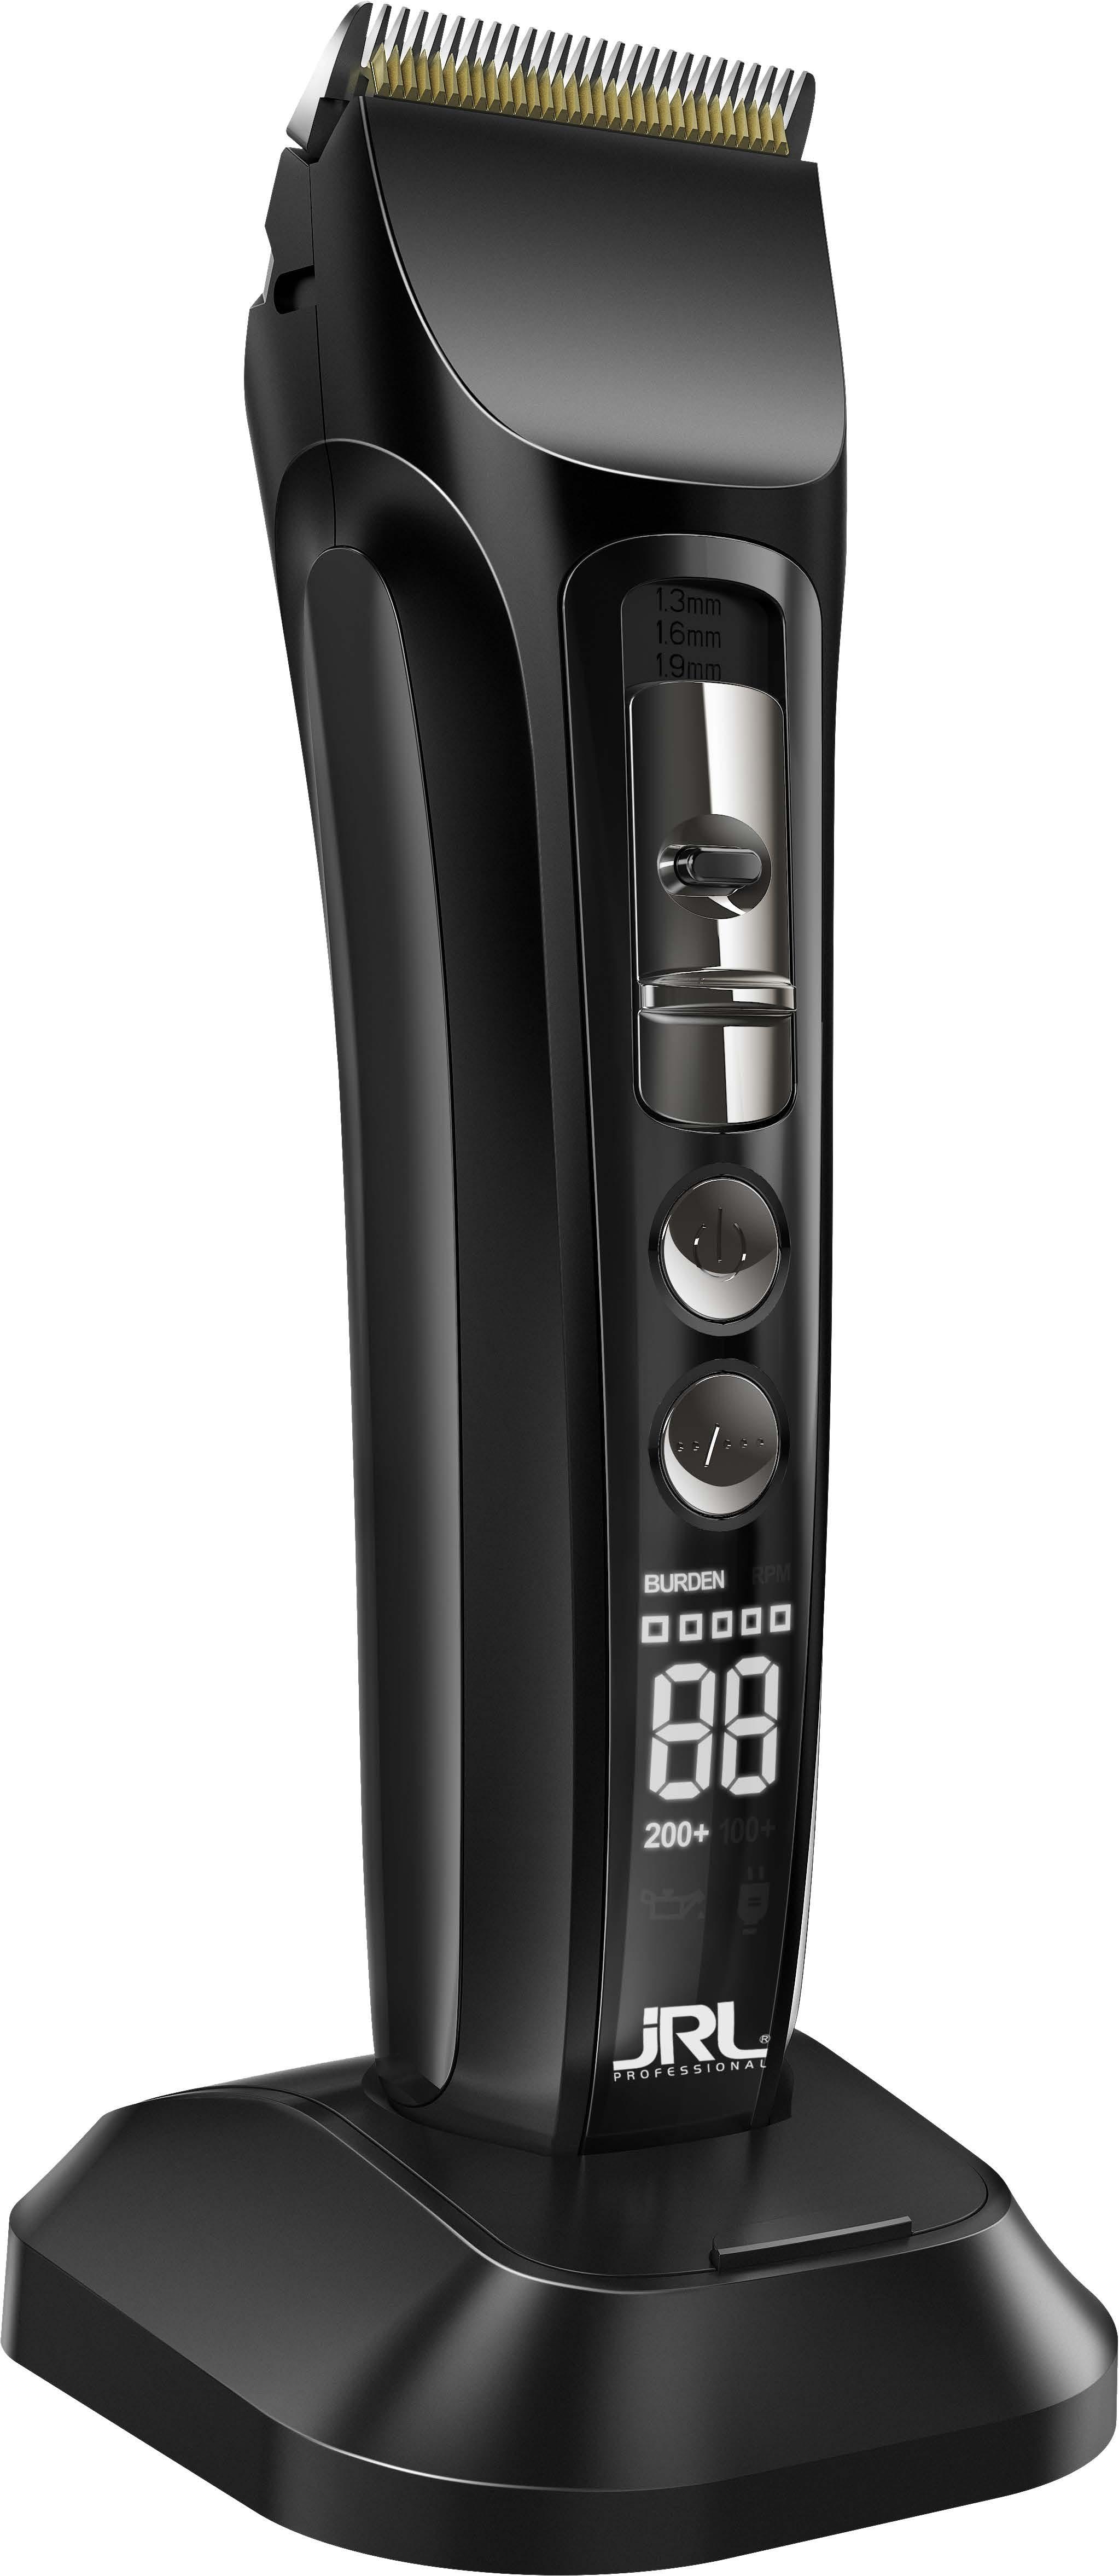 JRL Fresh Fade Clipper, black 1040 - profesionální akumulátorový strojek + Gembird - stlačený vzduch, 400 ml